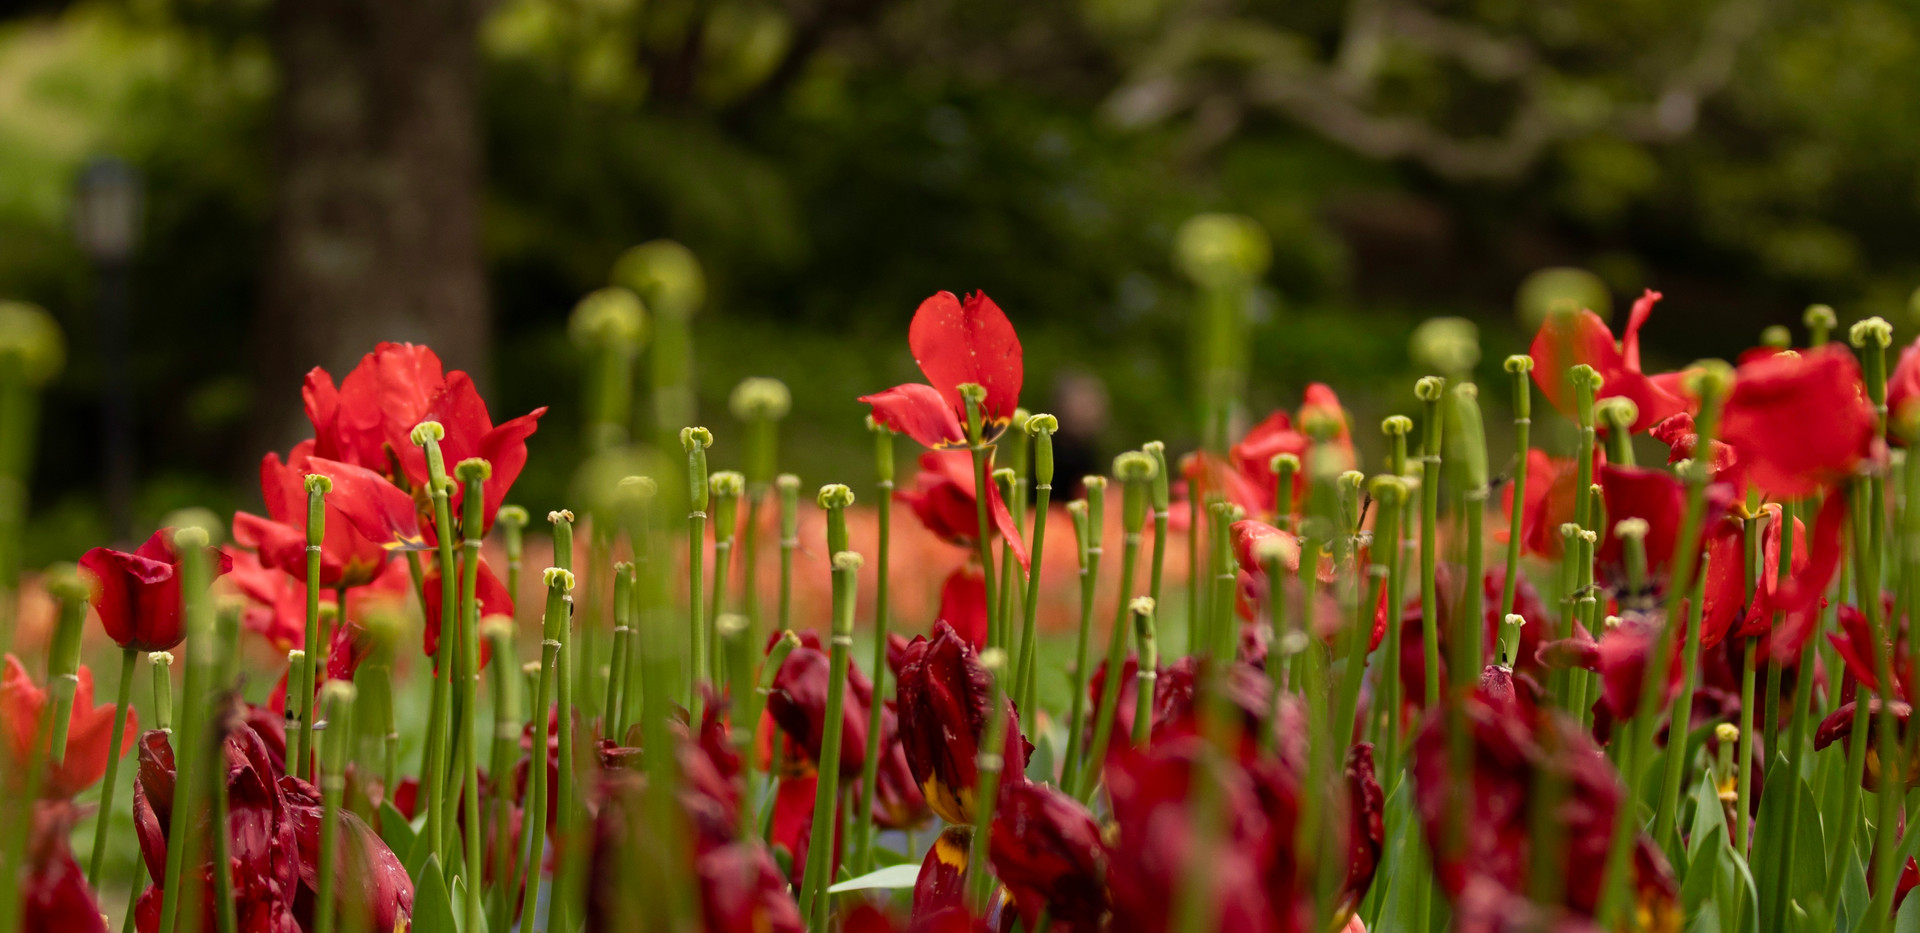 Poppies by Vandy Pollard